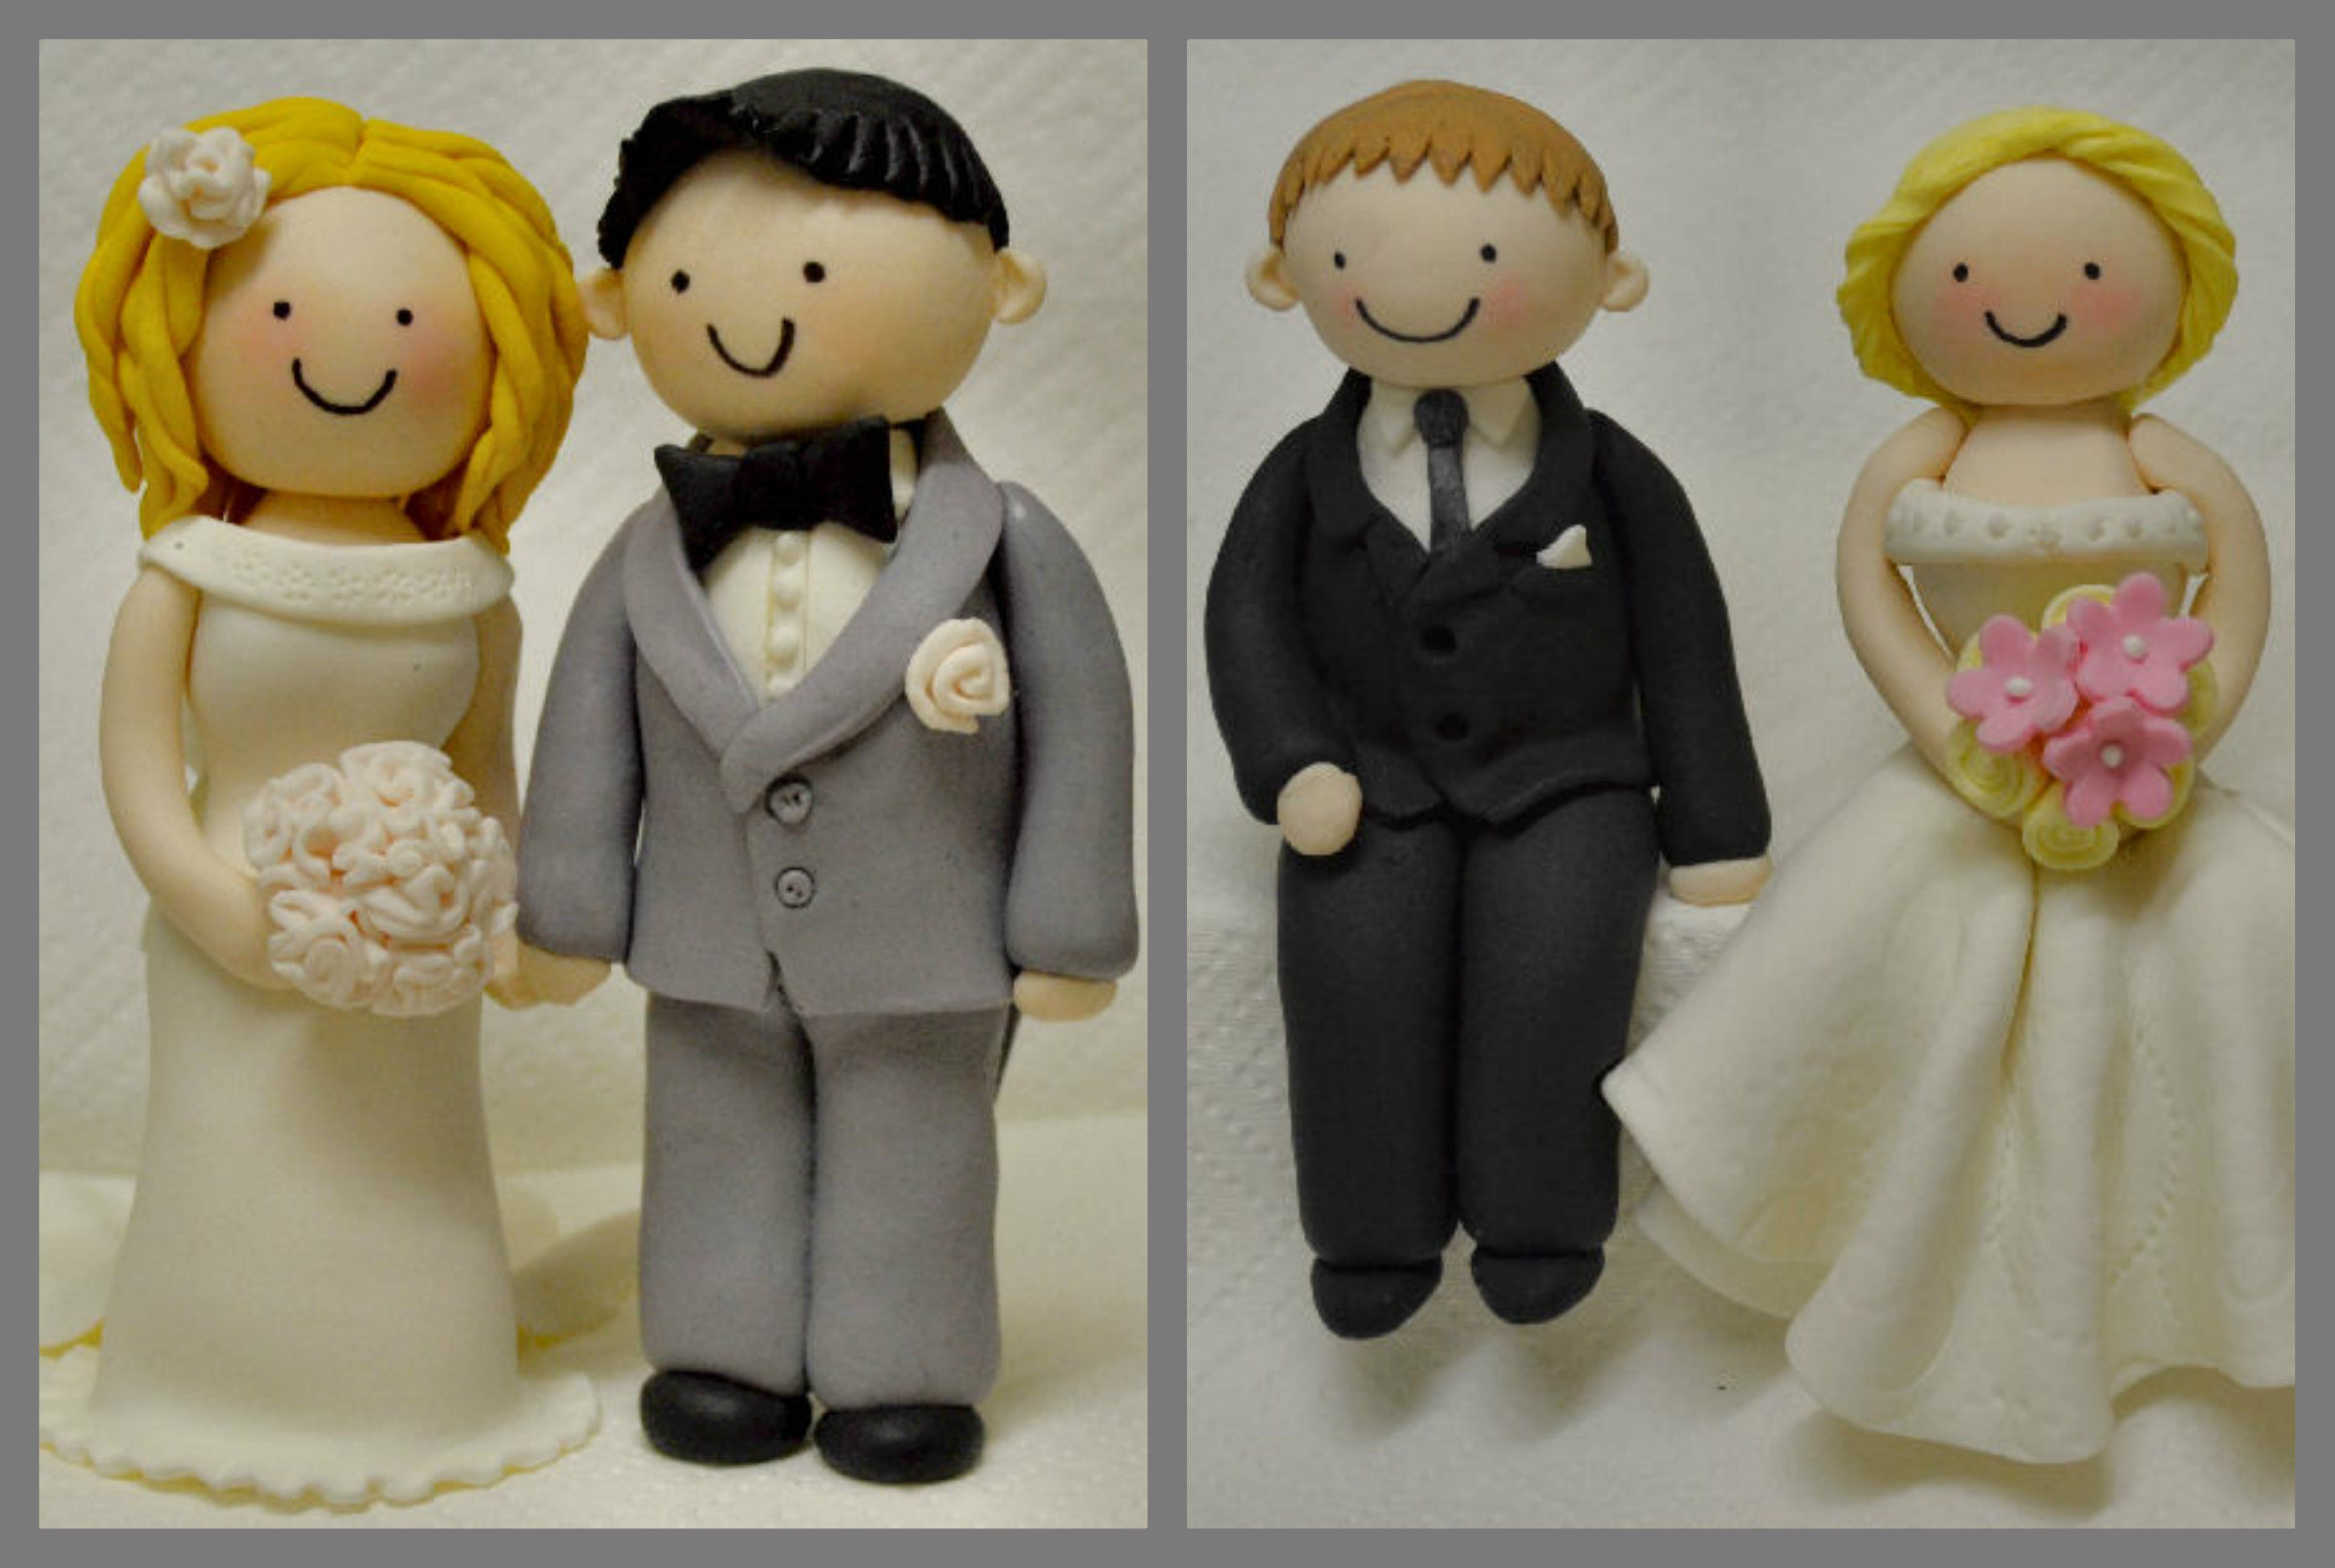 bride-and-groom-collage.jpg